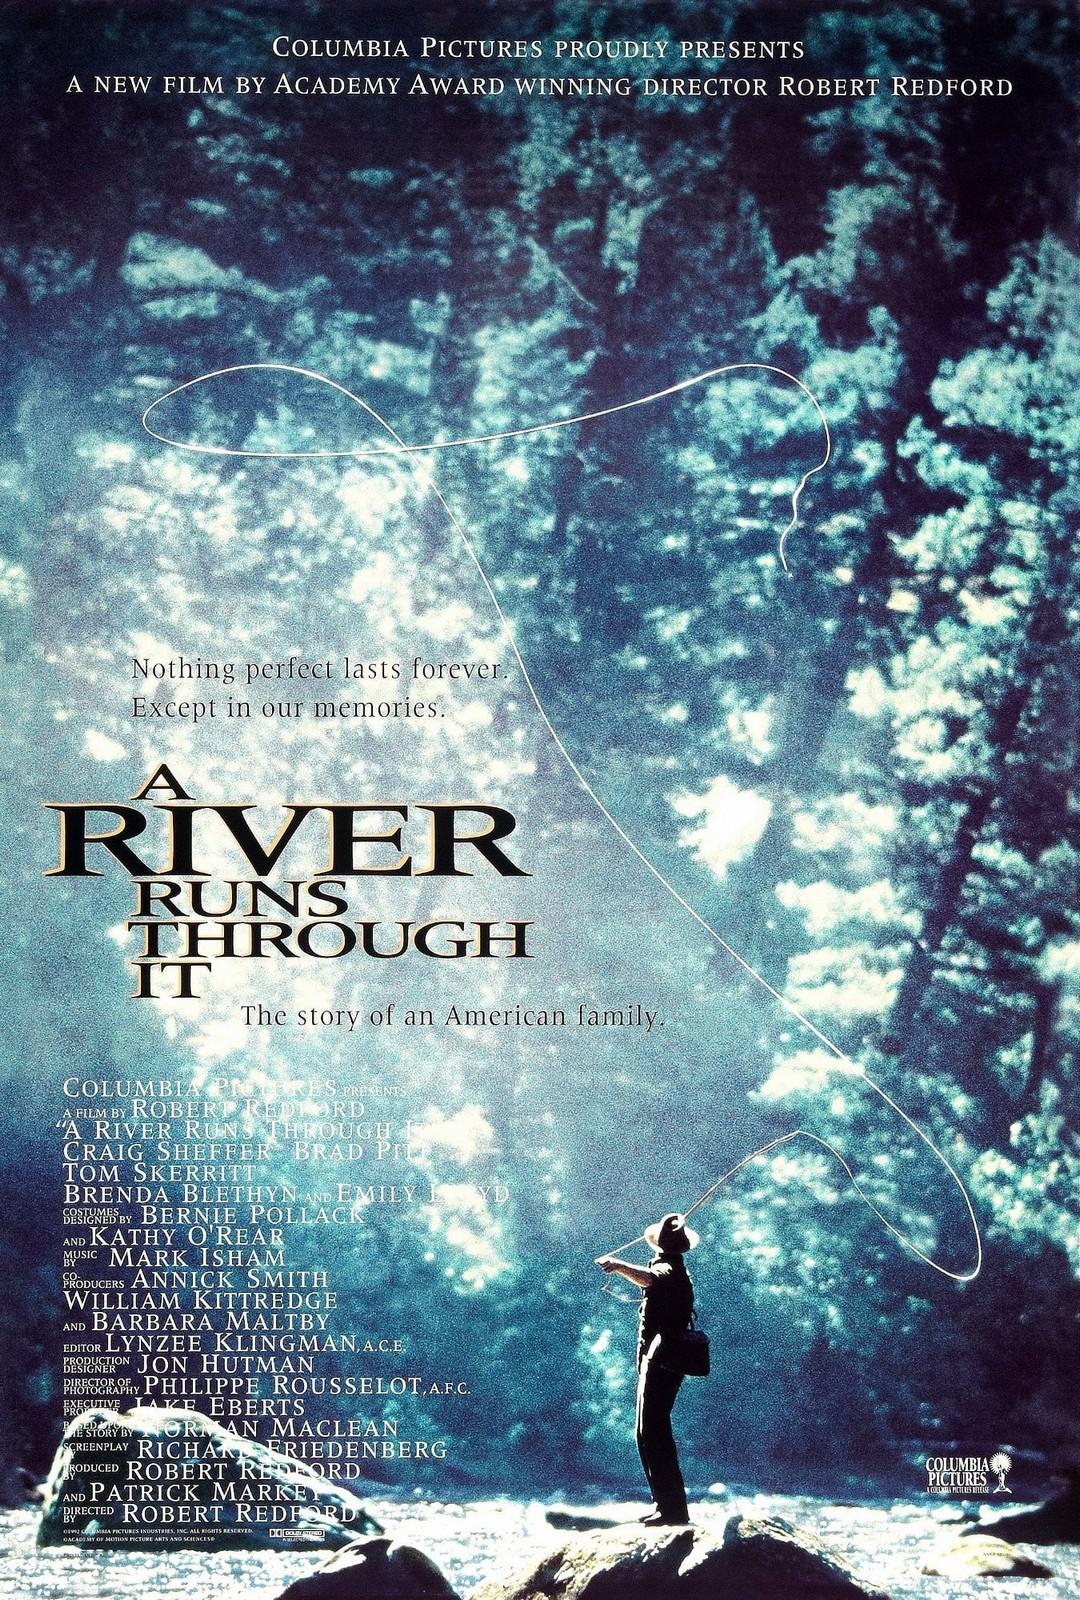 Movie, A River Runs Through It(美國, 1992年) / 大河戀(台灣) / 川流歲月(香港), 電影海報, 美國